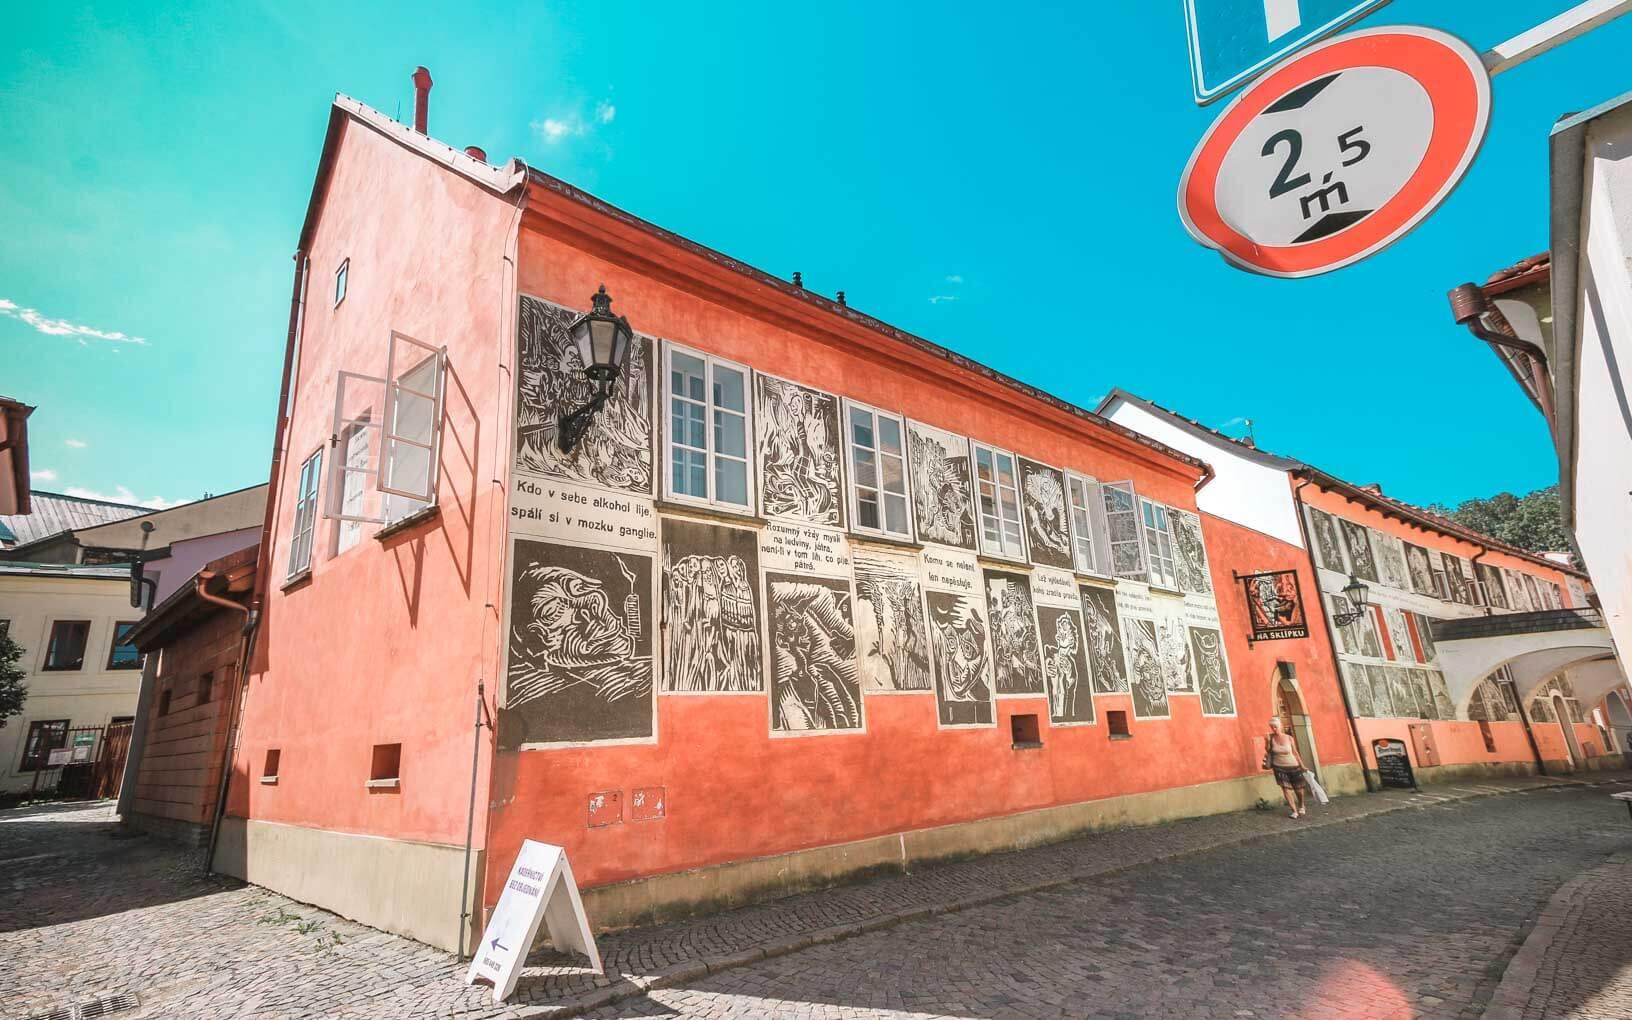 Josefa Váchala street - Visit Litomysl in Czech Republic